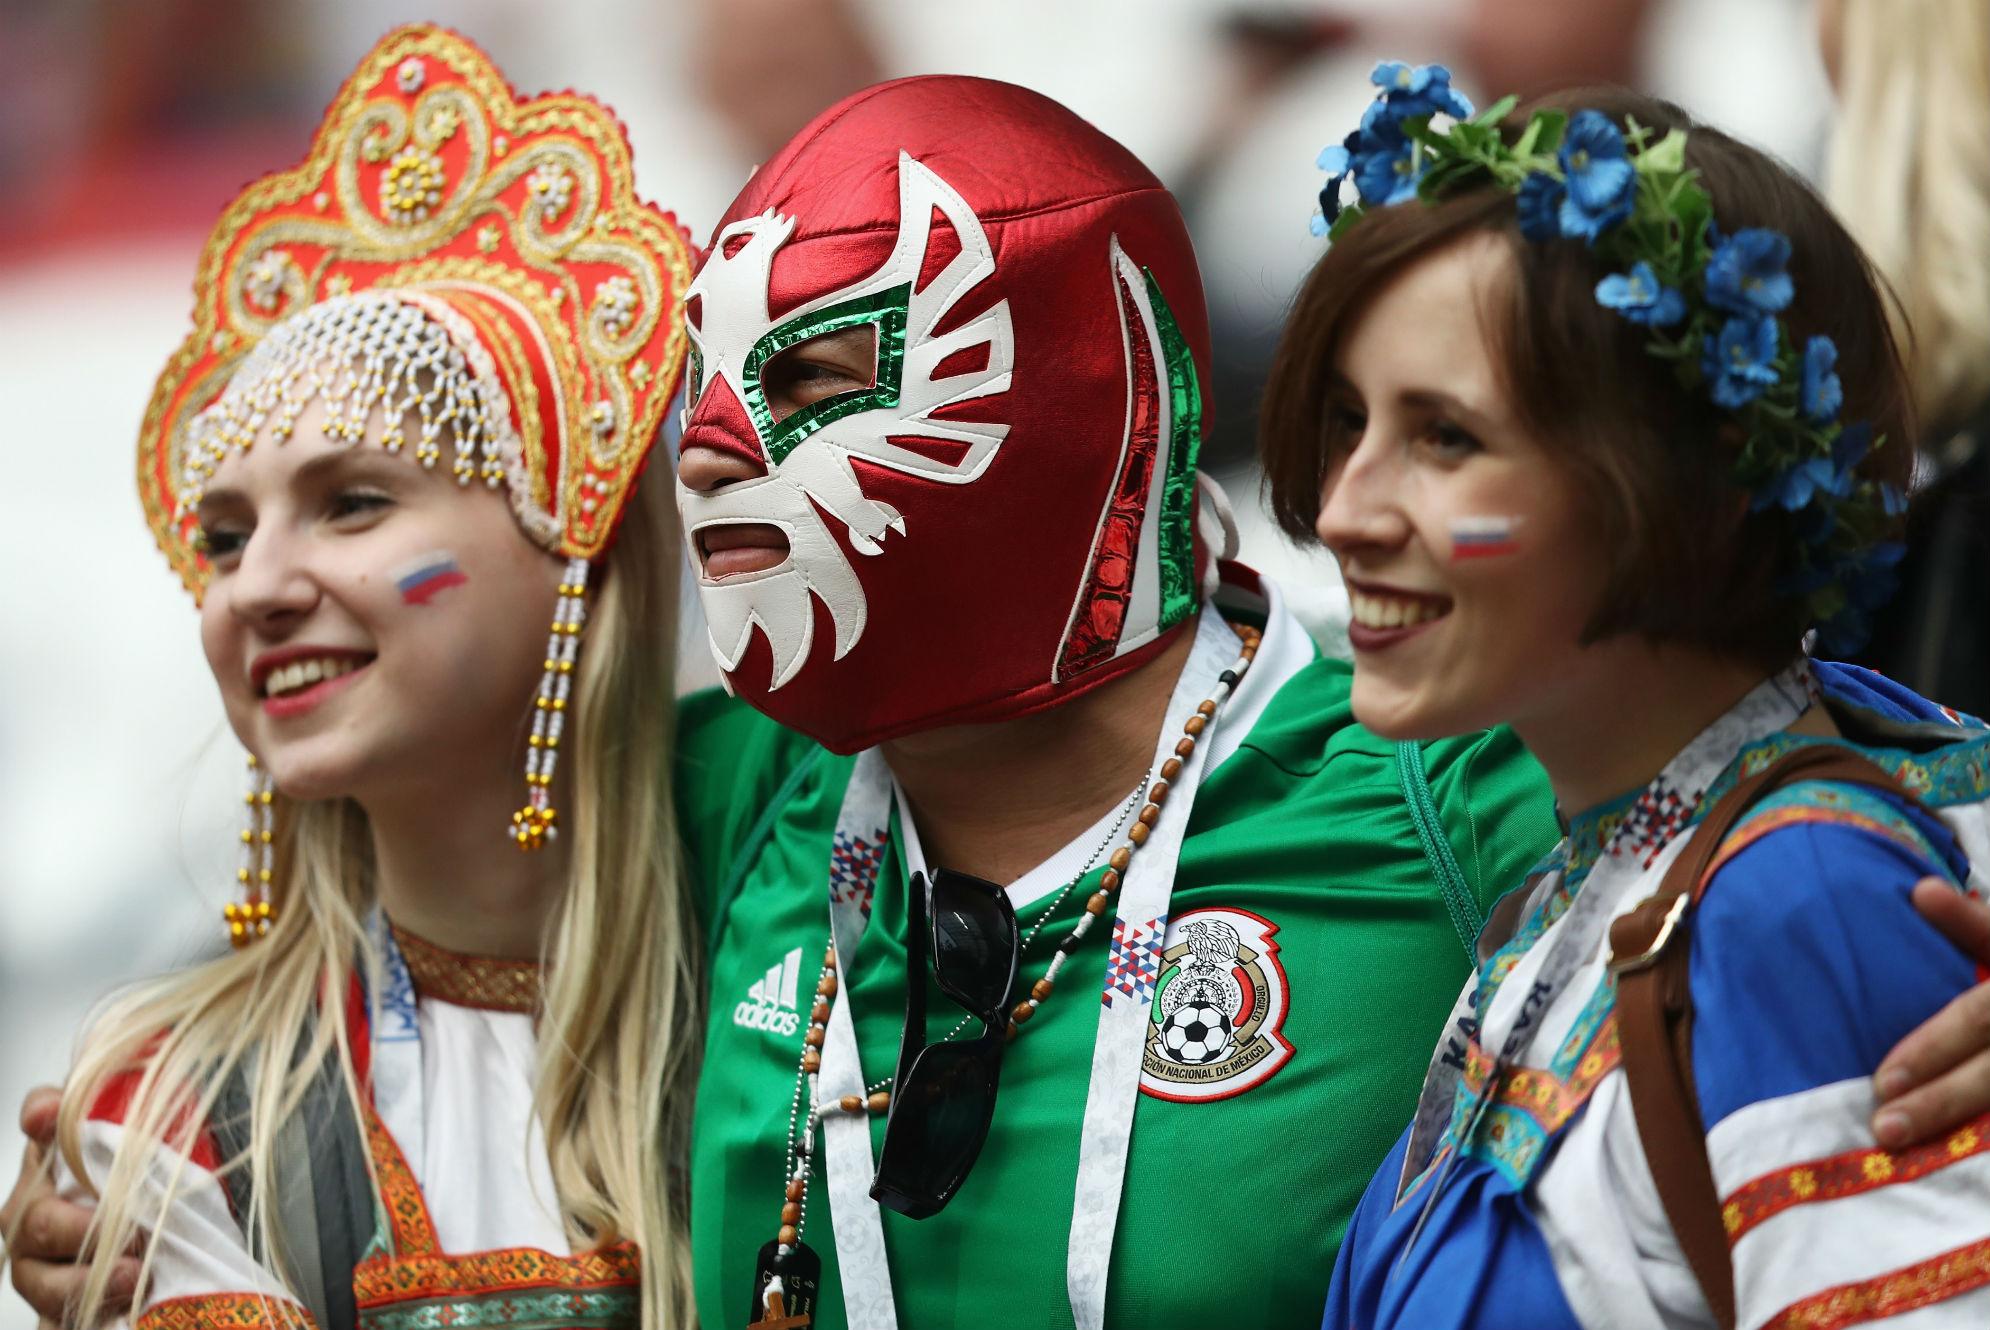 Russia Mexico fans